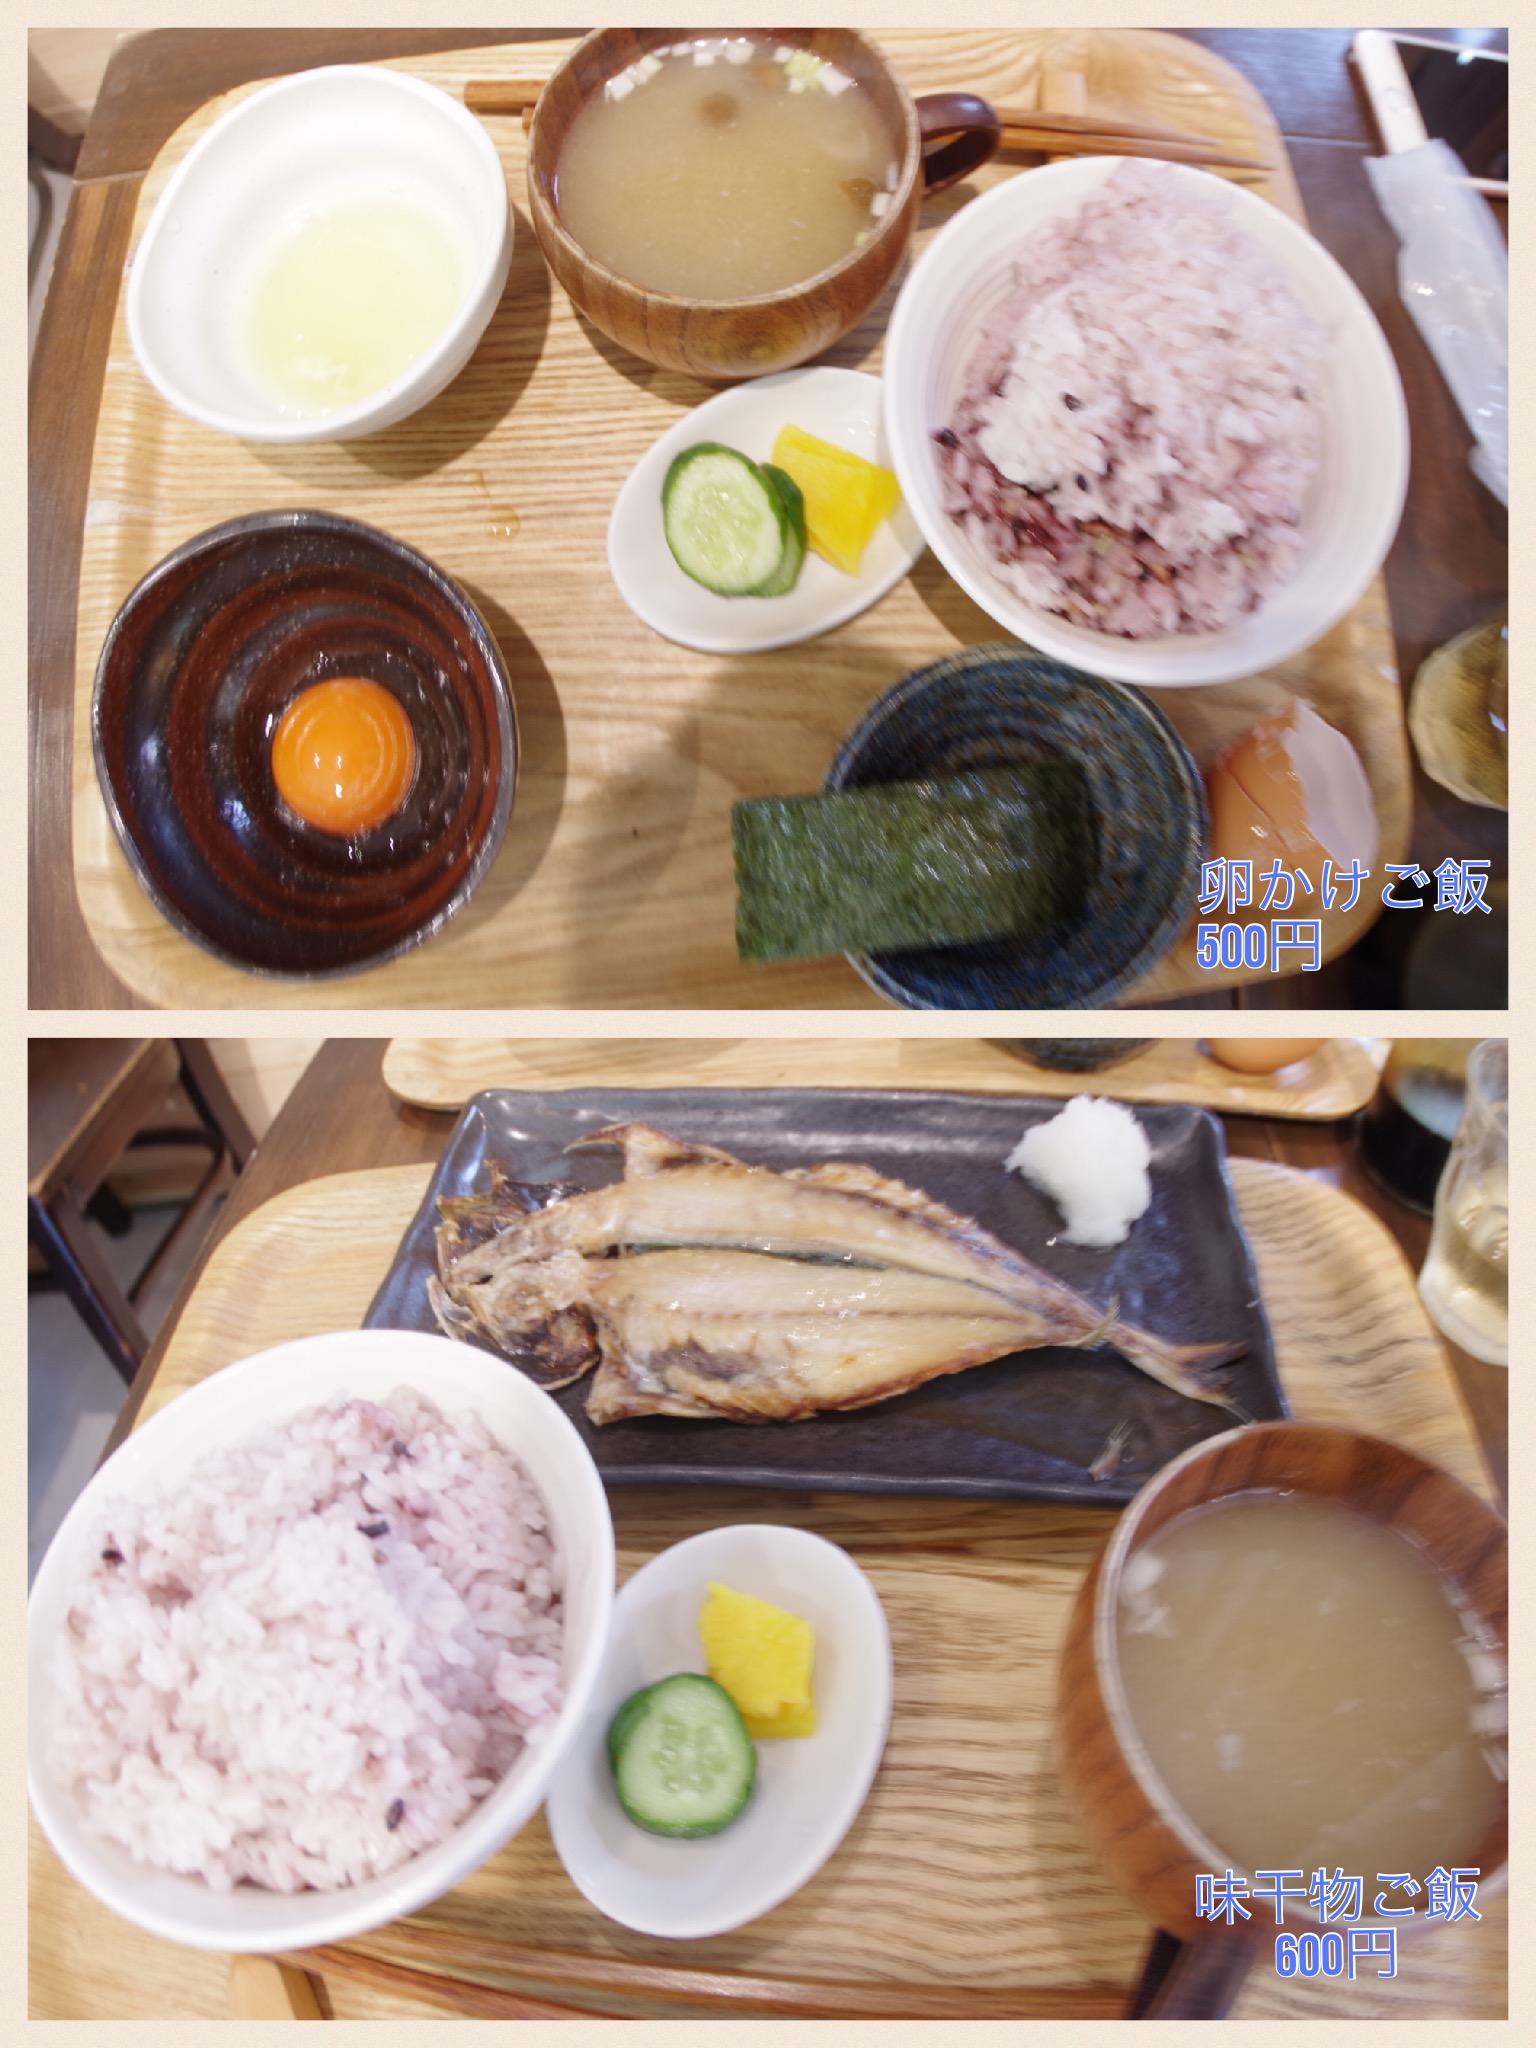 「Cafe ヨリドコロ」さんの卵かけご飯